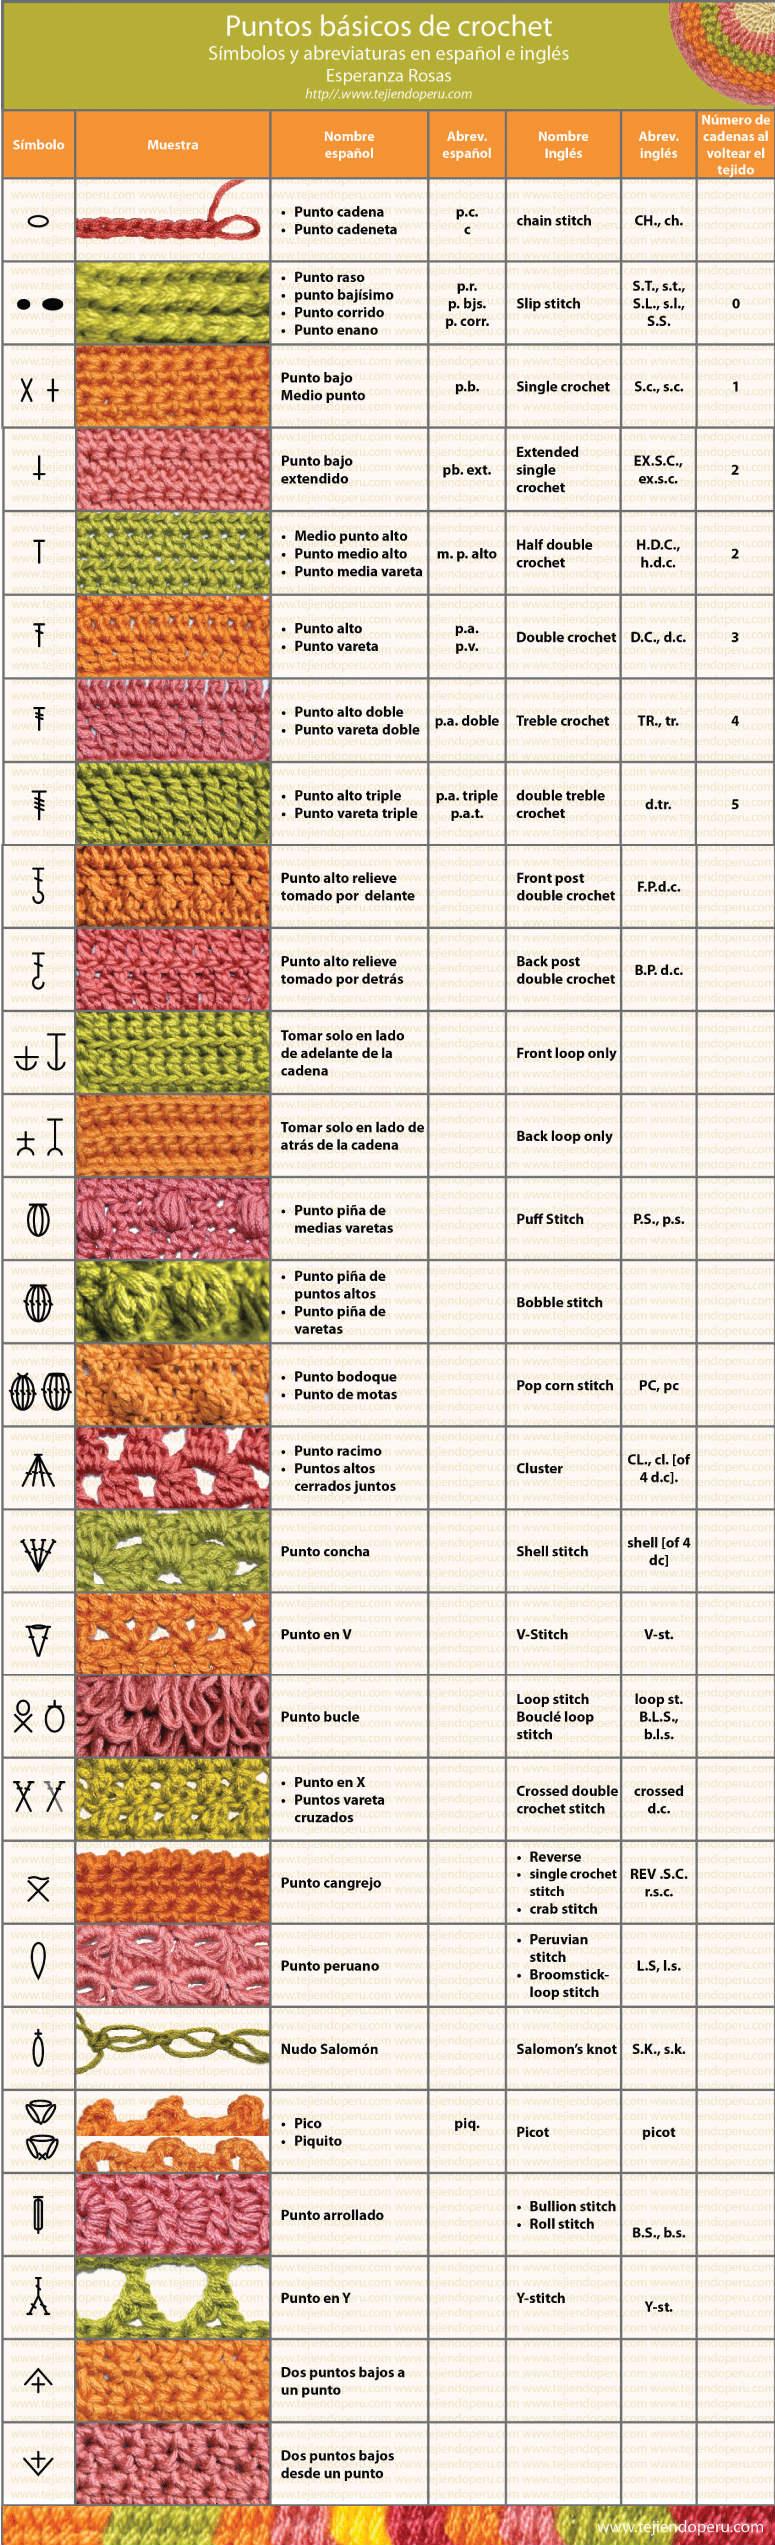 abreviaturas-puntos-crochet